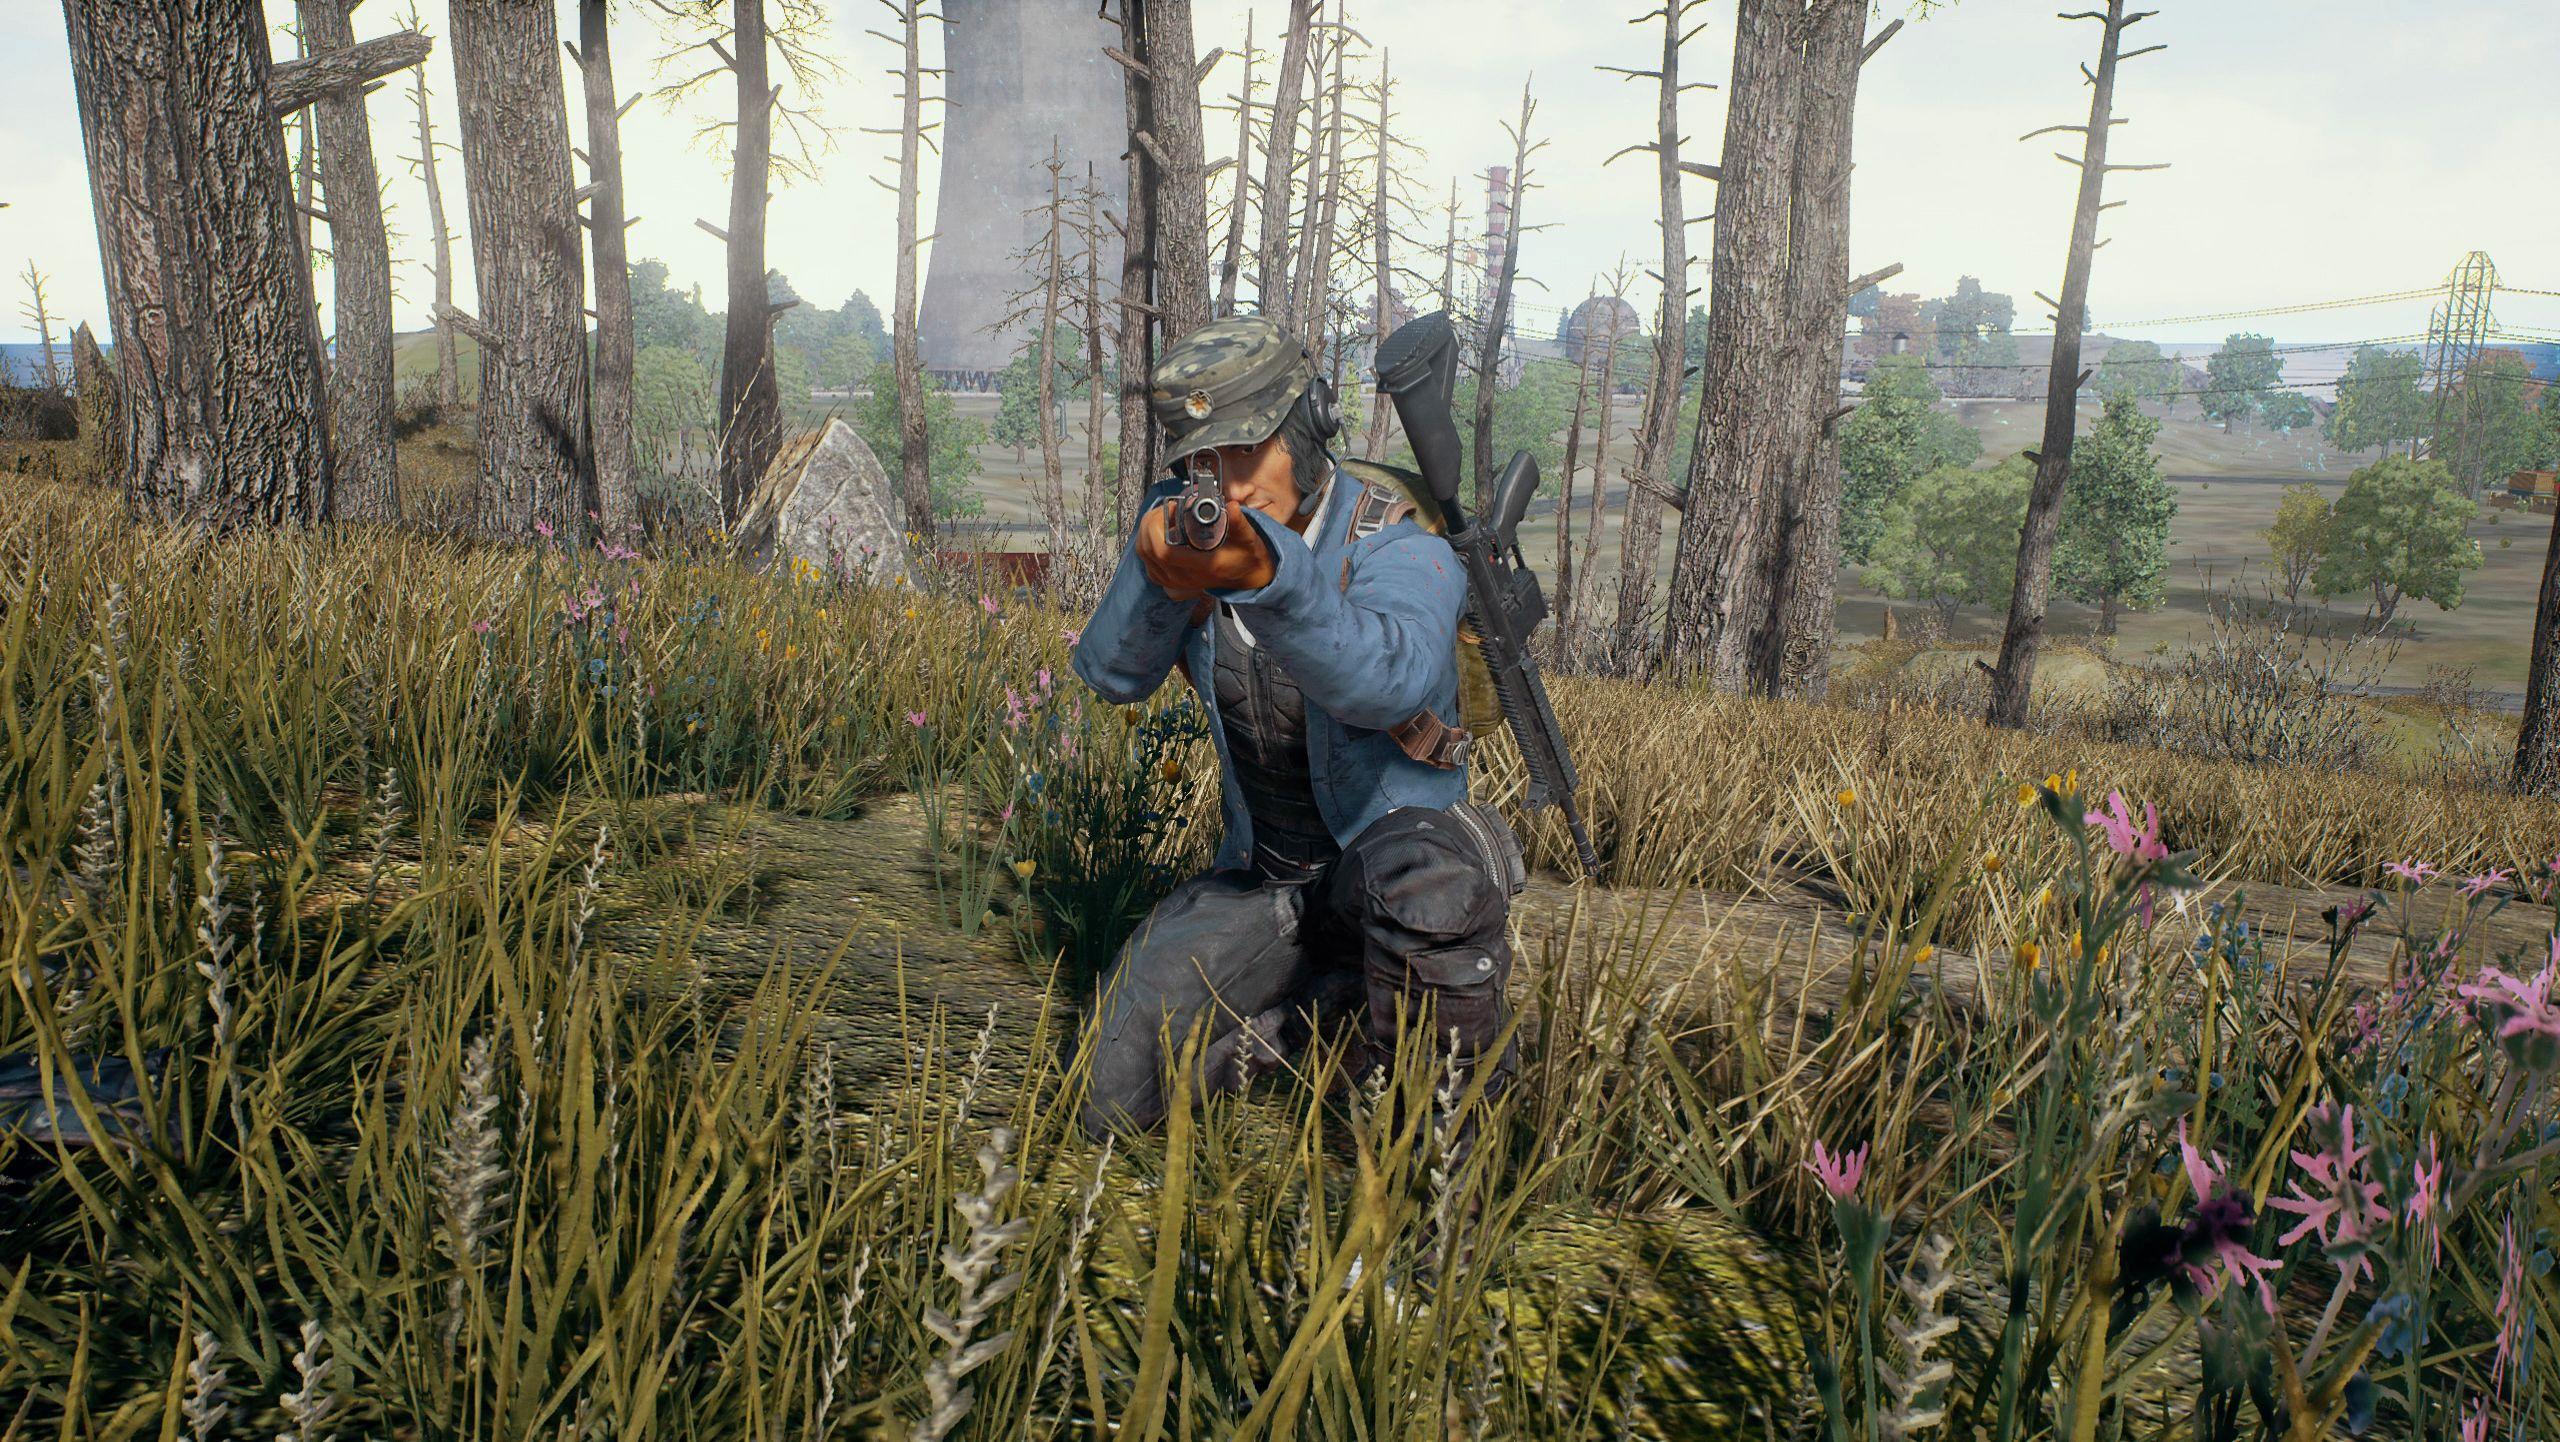 PlayerUnknowns Battlegrounds PUBG Wallpapers and Photos 2560x1442